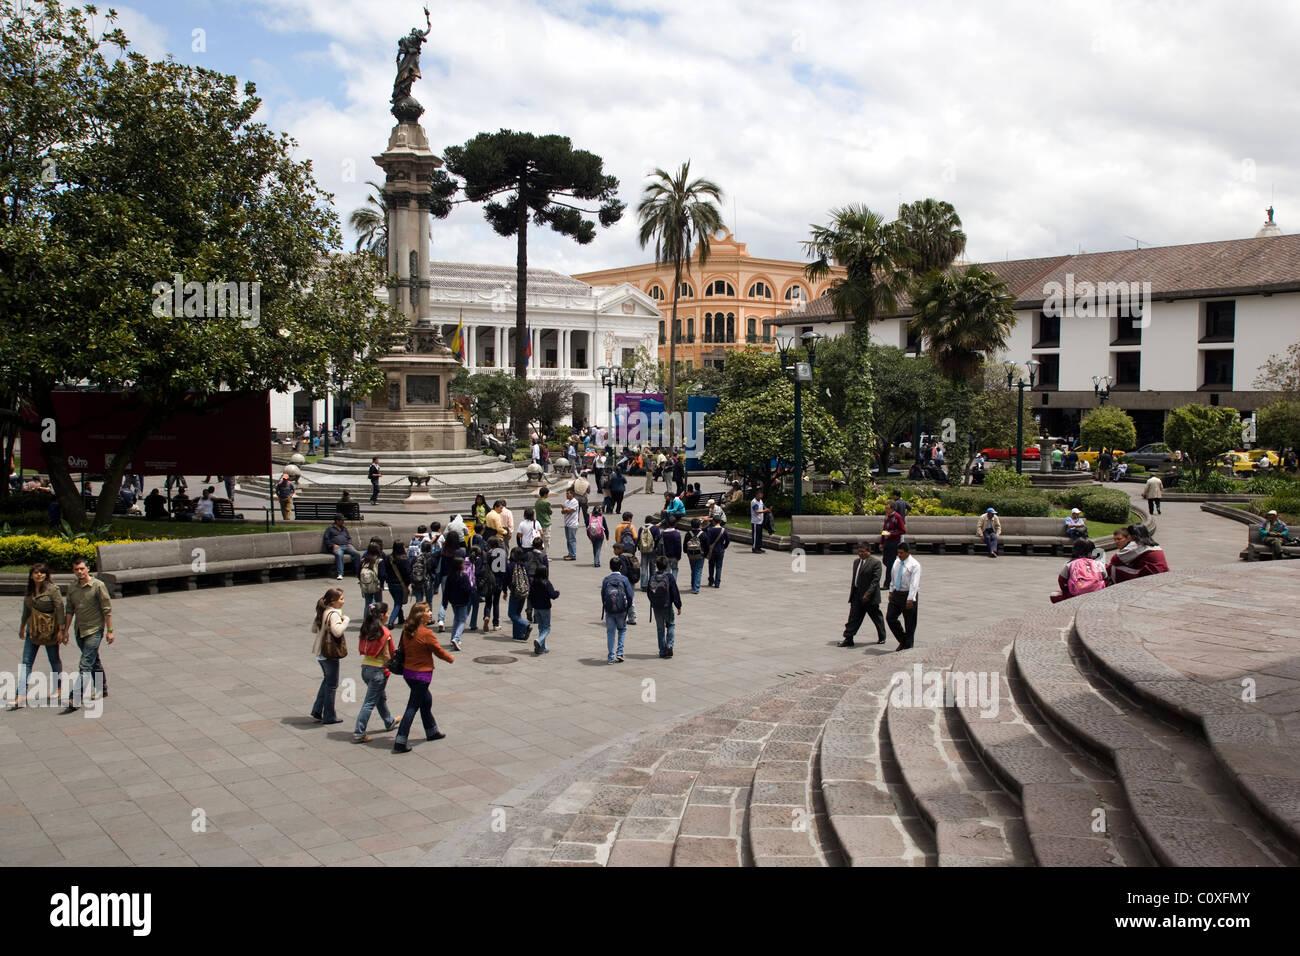 Plaza Independencia - Quito, Ecuador Imagen De Stock